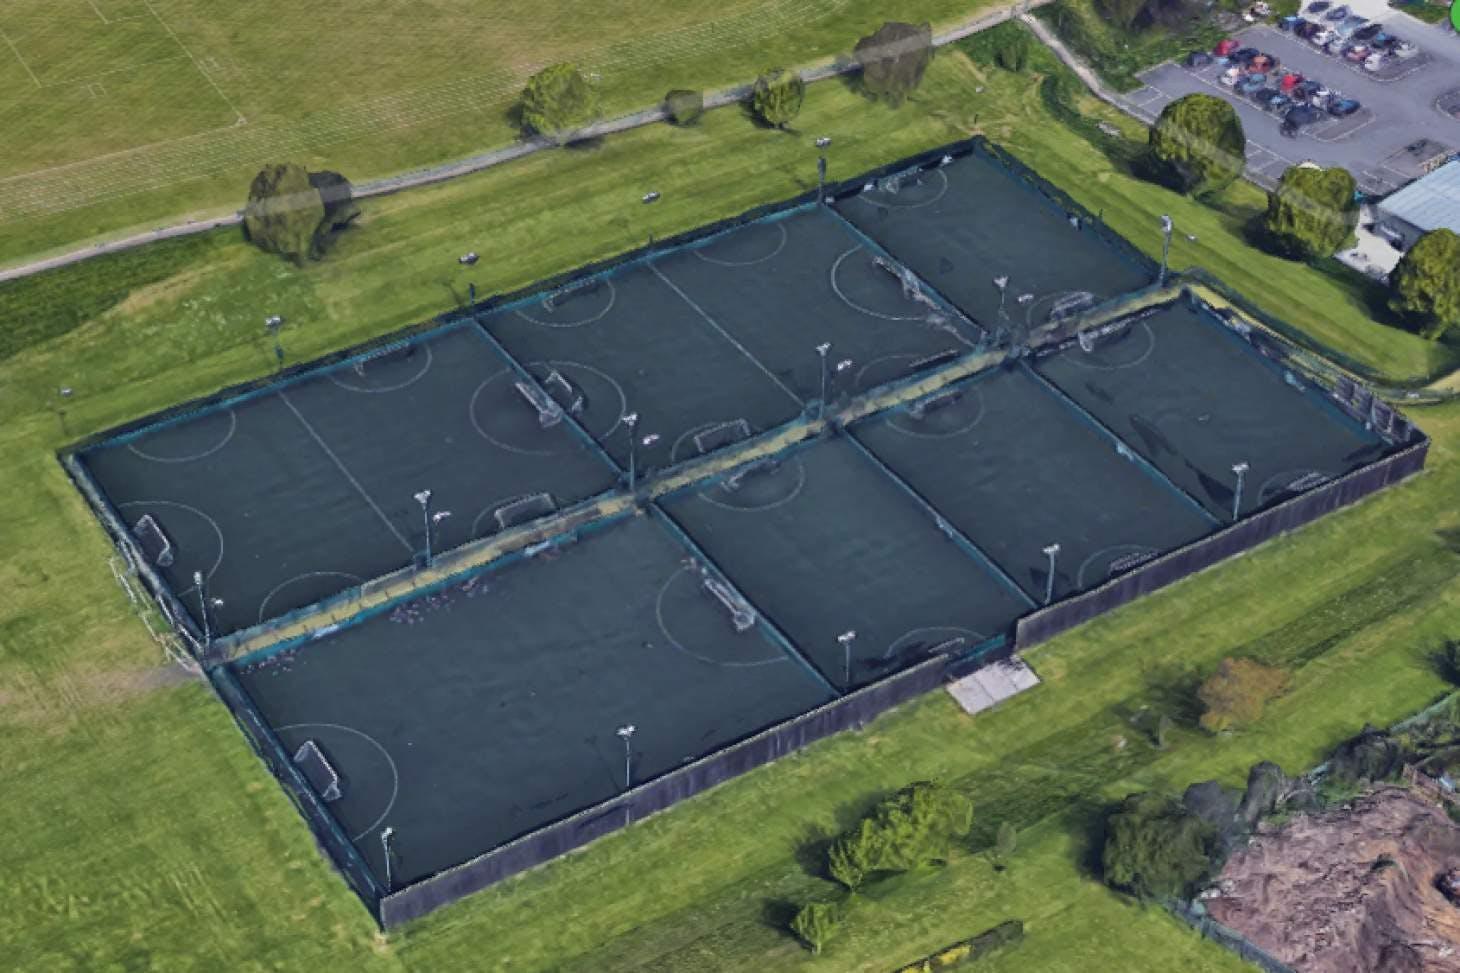 PlayFootball Gillingham 7 a side | 3G Astroturf football pitch